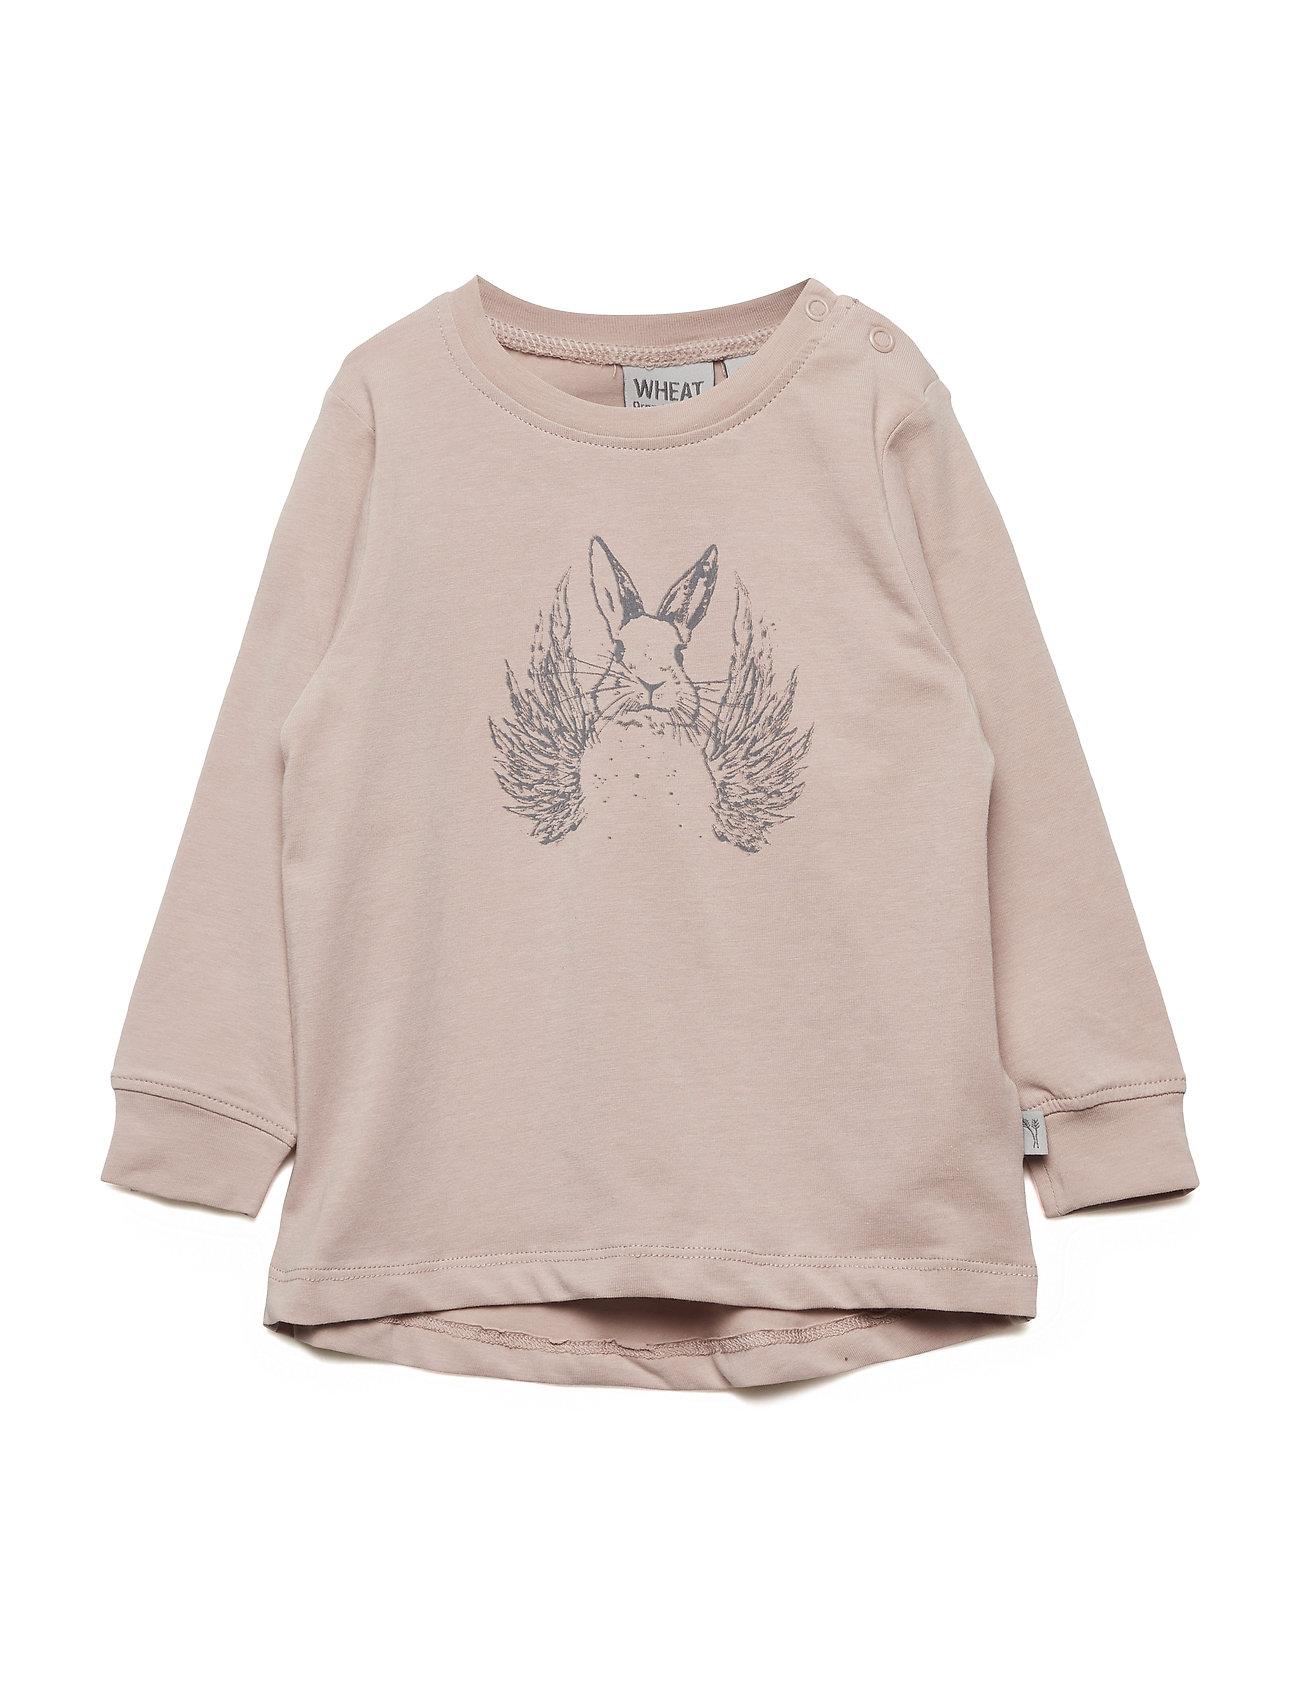 Wheat T-Shirt Flying Rabbit - ROSE POWDER